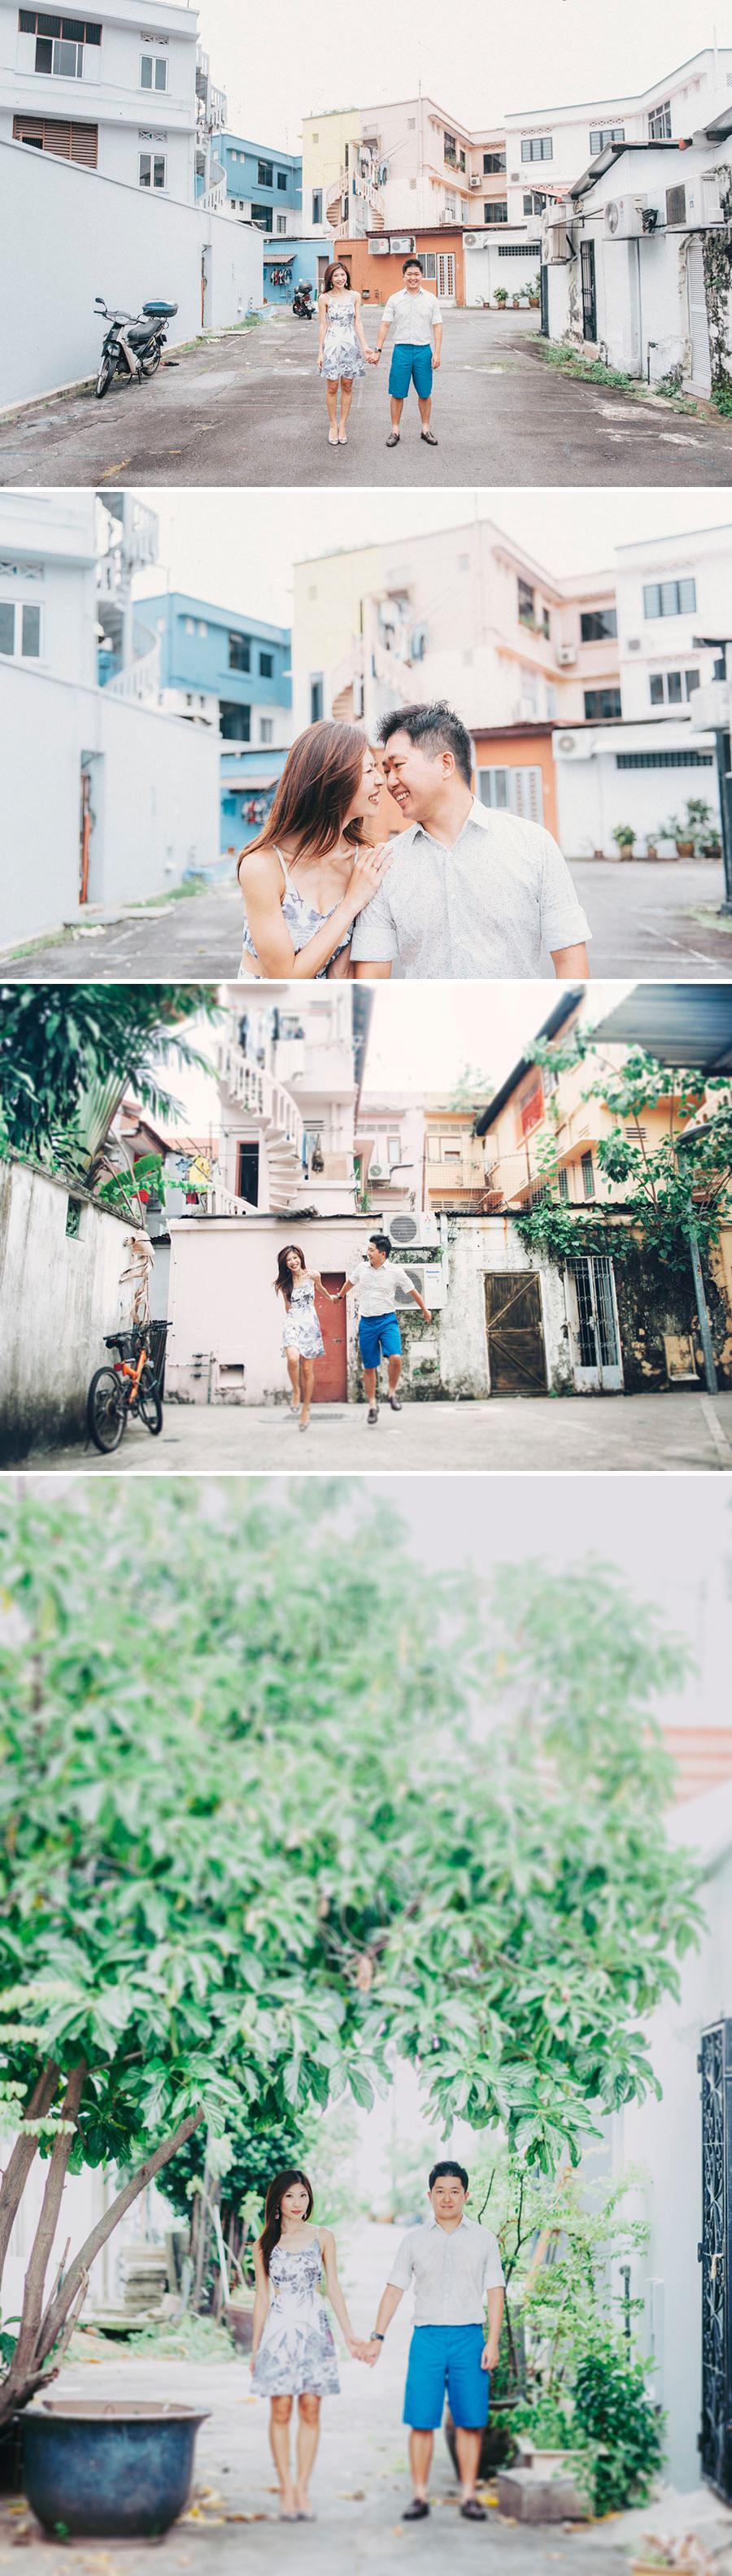 Secret Shooting Spots Of Photographers In Singapore Part 1 Pre Wedding Photoshoot Wedding Photoshoot Pre Wedding Photos